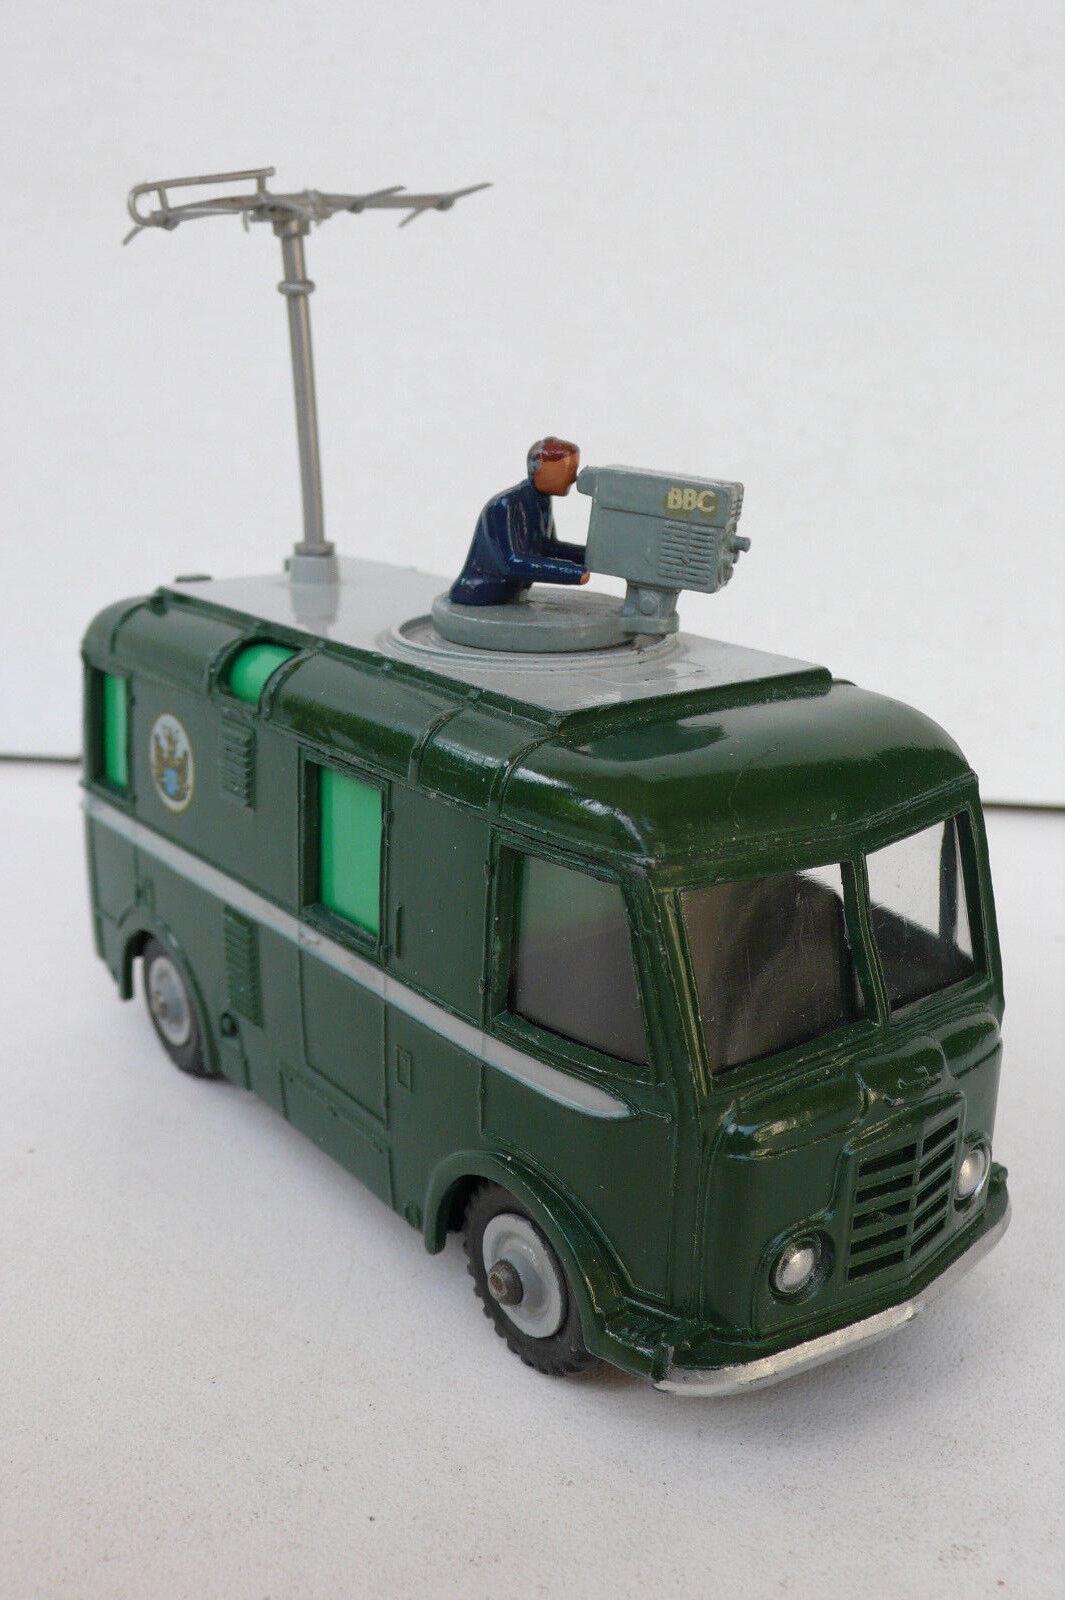 DINKY TOYS  ENGLAND COMMER  BBC TV ROVING EYE   REF 968  59 64  BON ÉTAT  expédition rapide